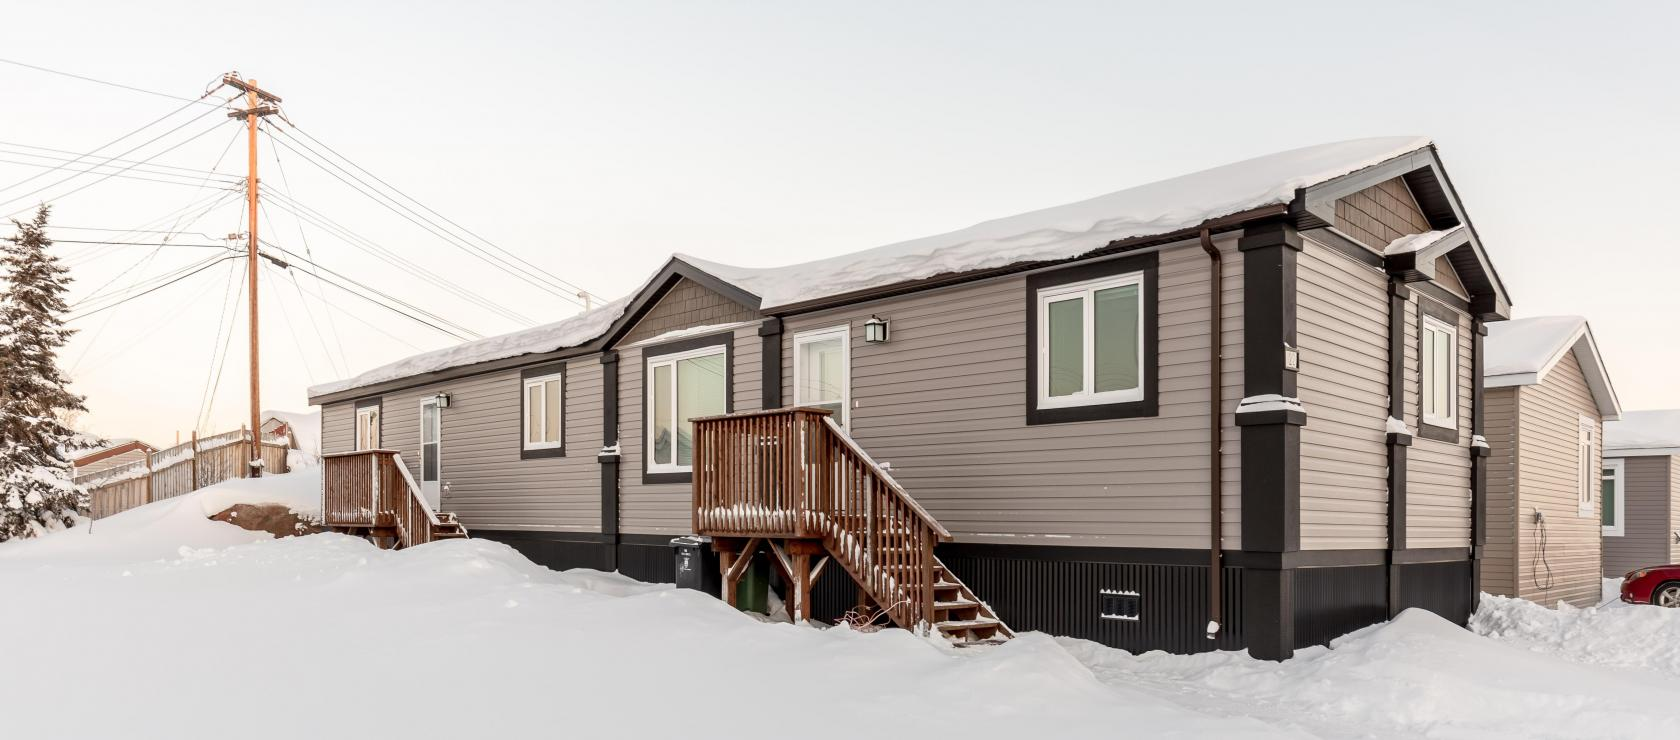 22 Spence Road, Range Lake, Yellowknife 2